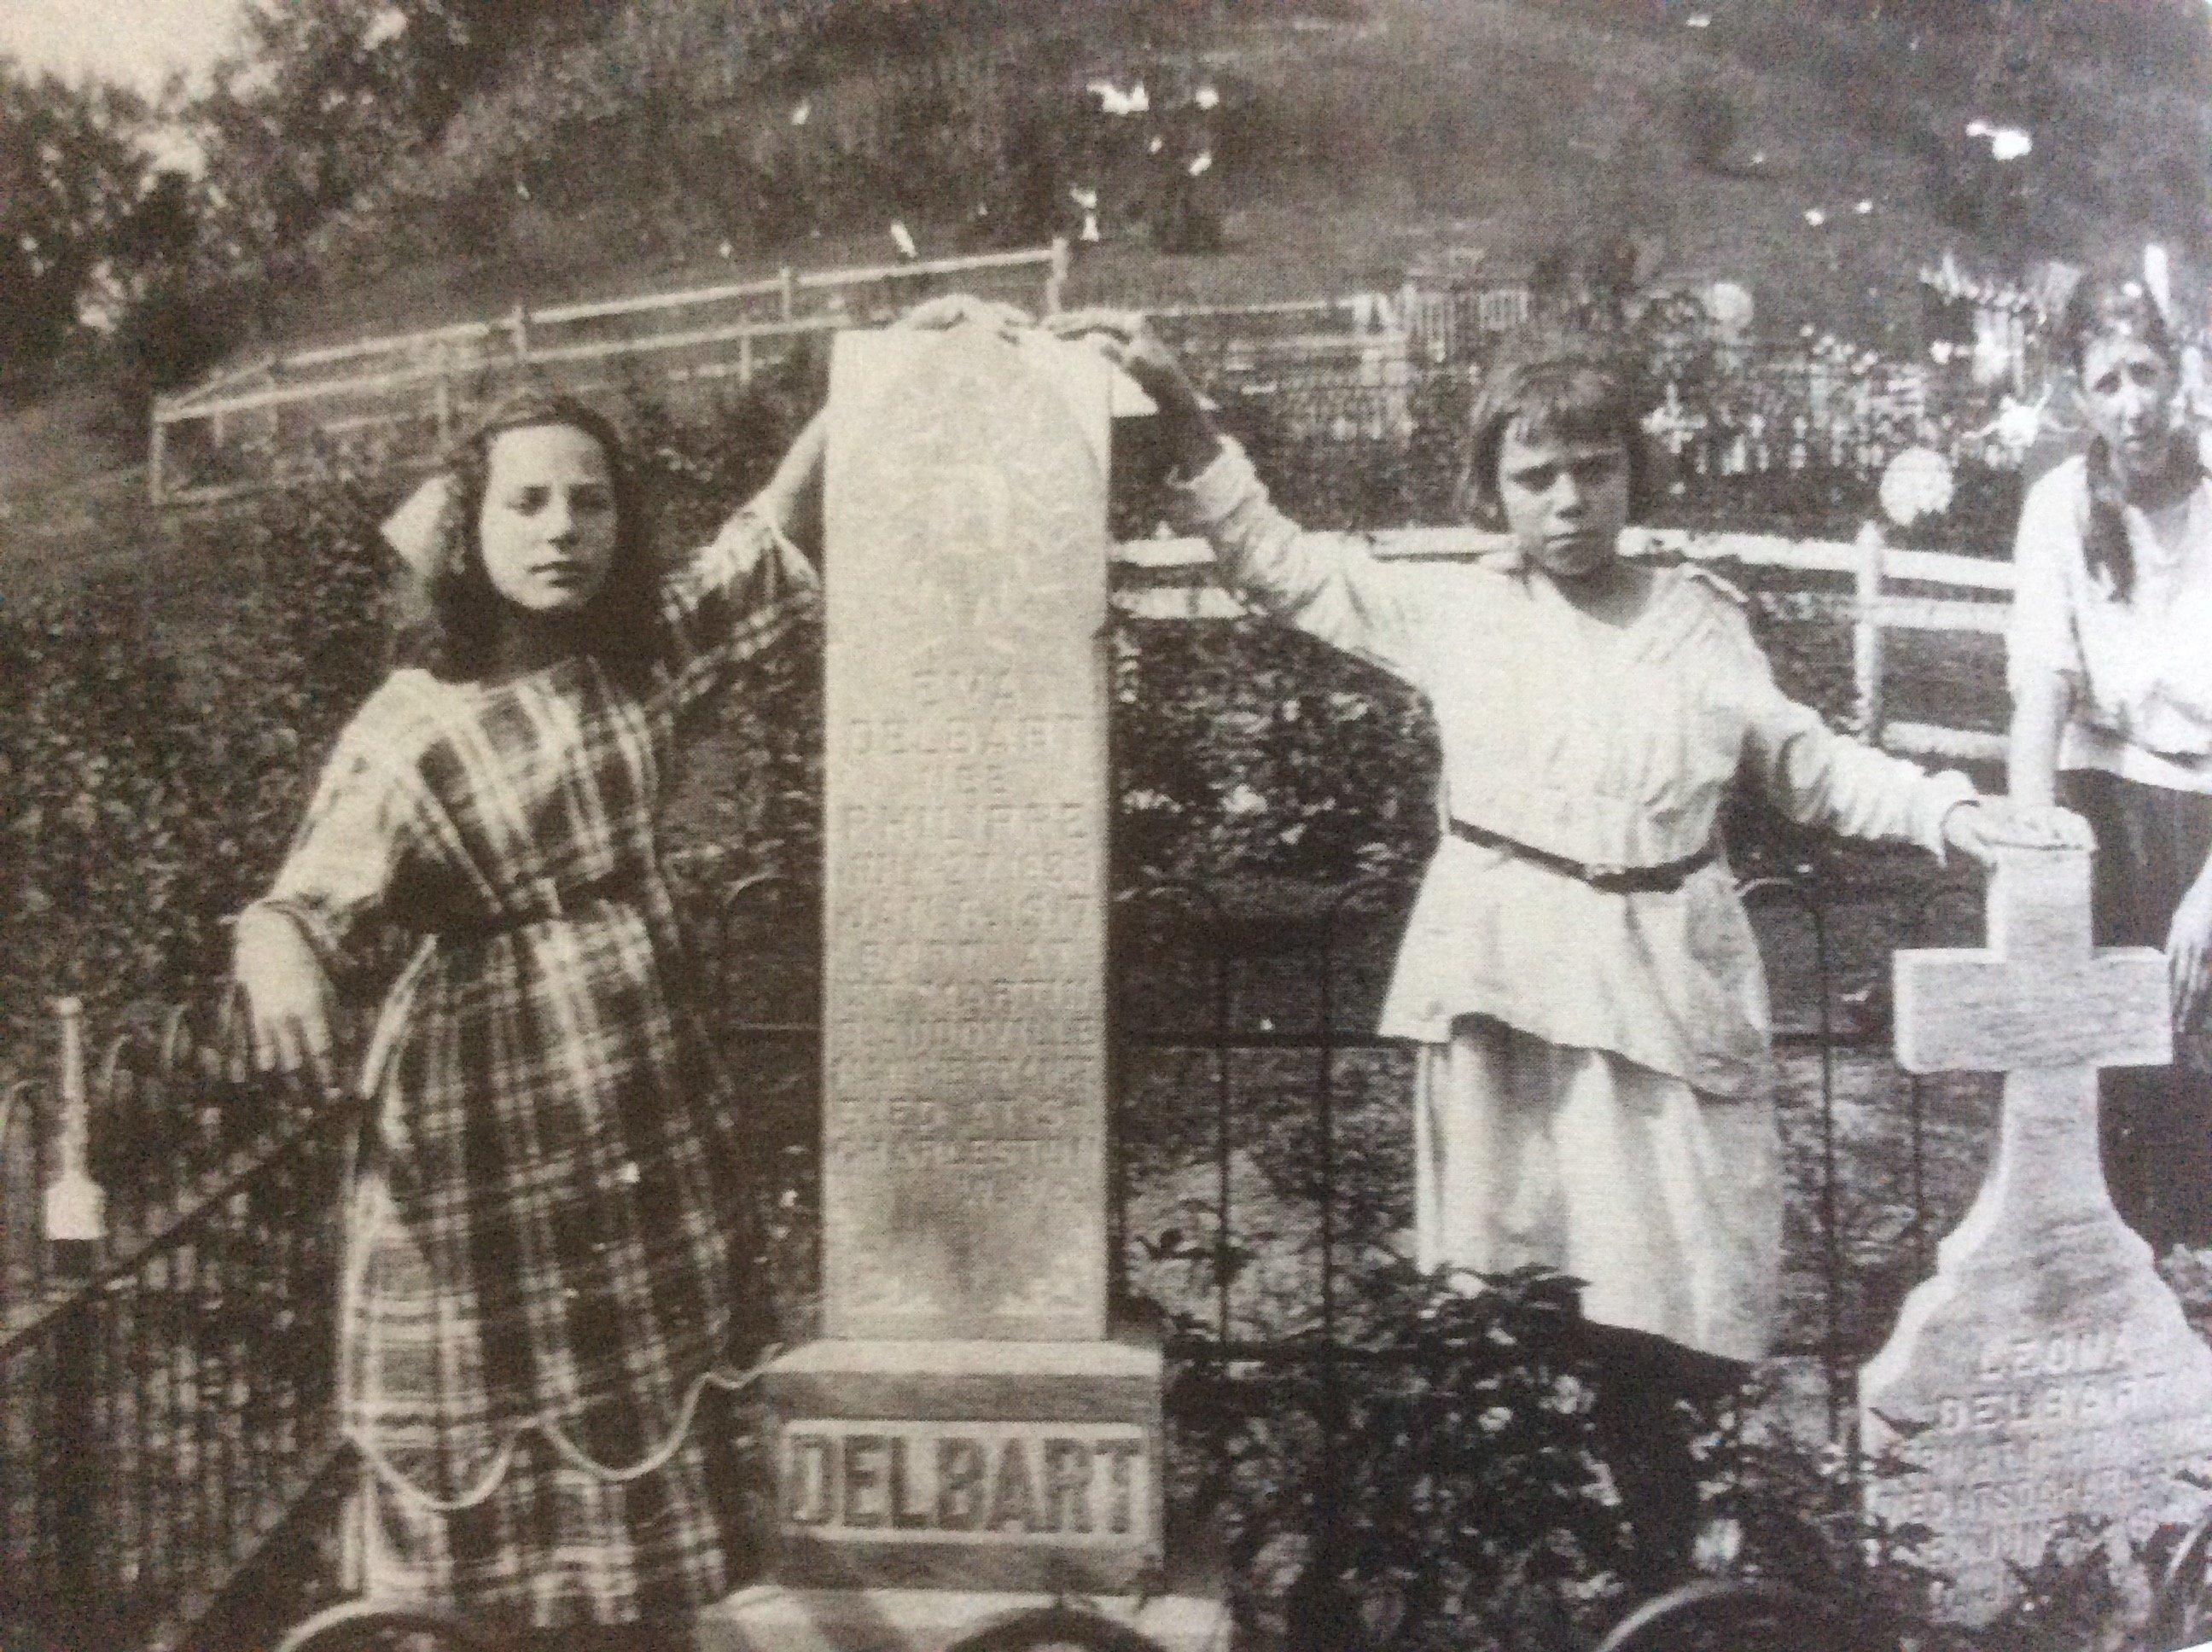 Around 1918, three Belgian girls pose in the Glendale Cemetery.